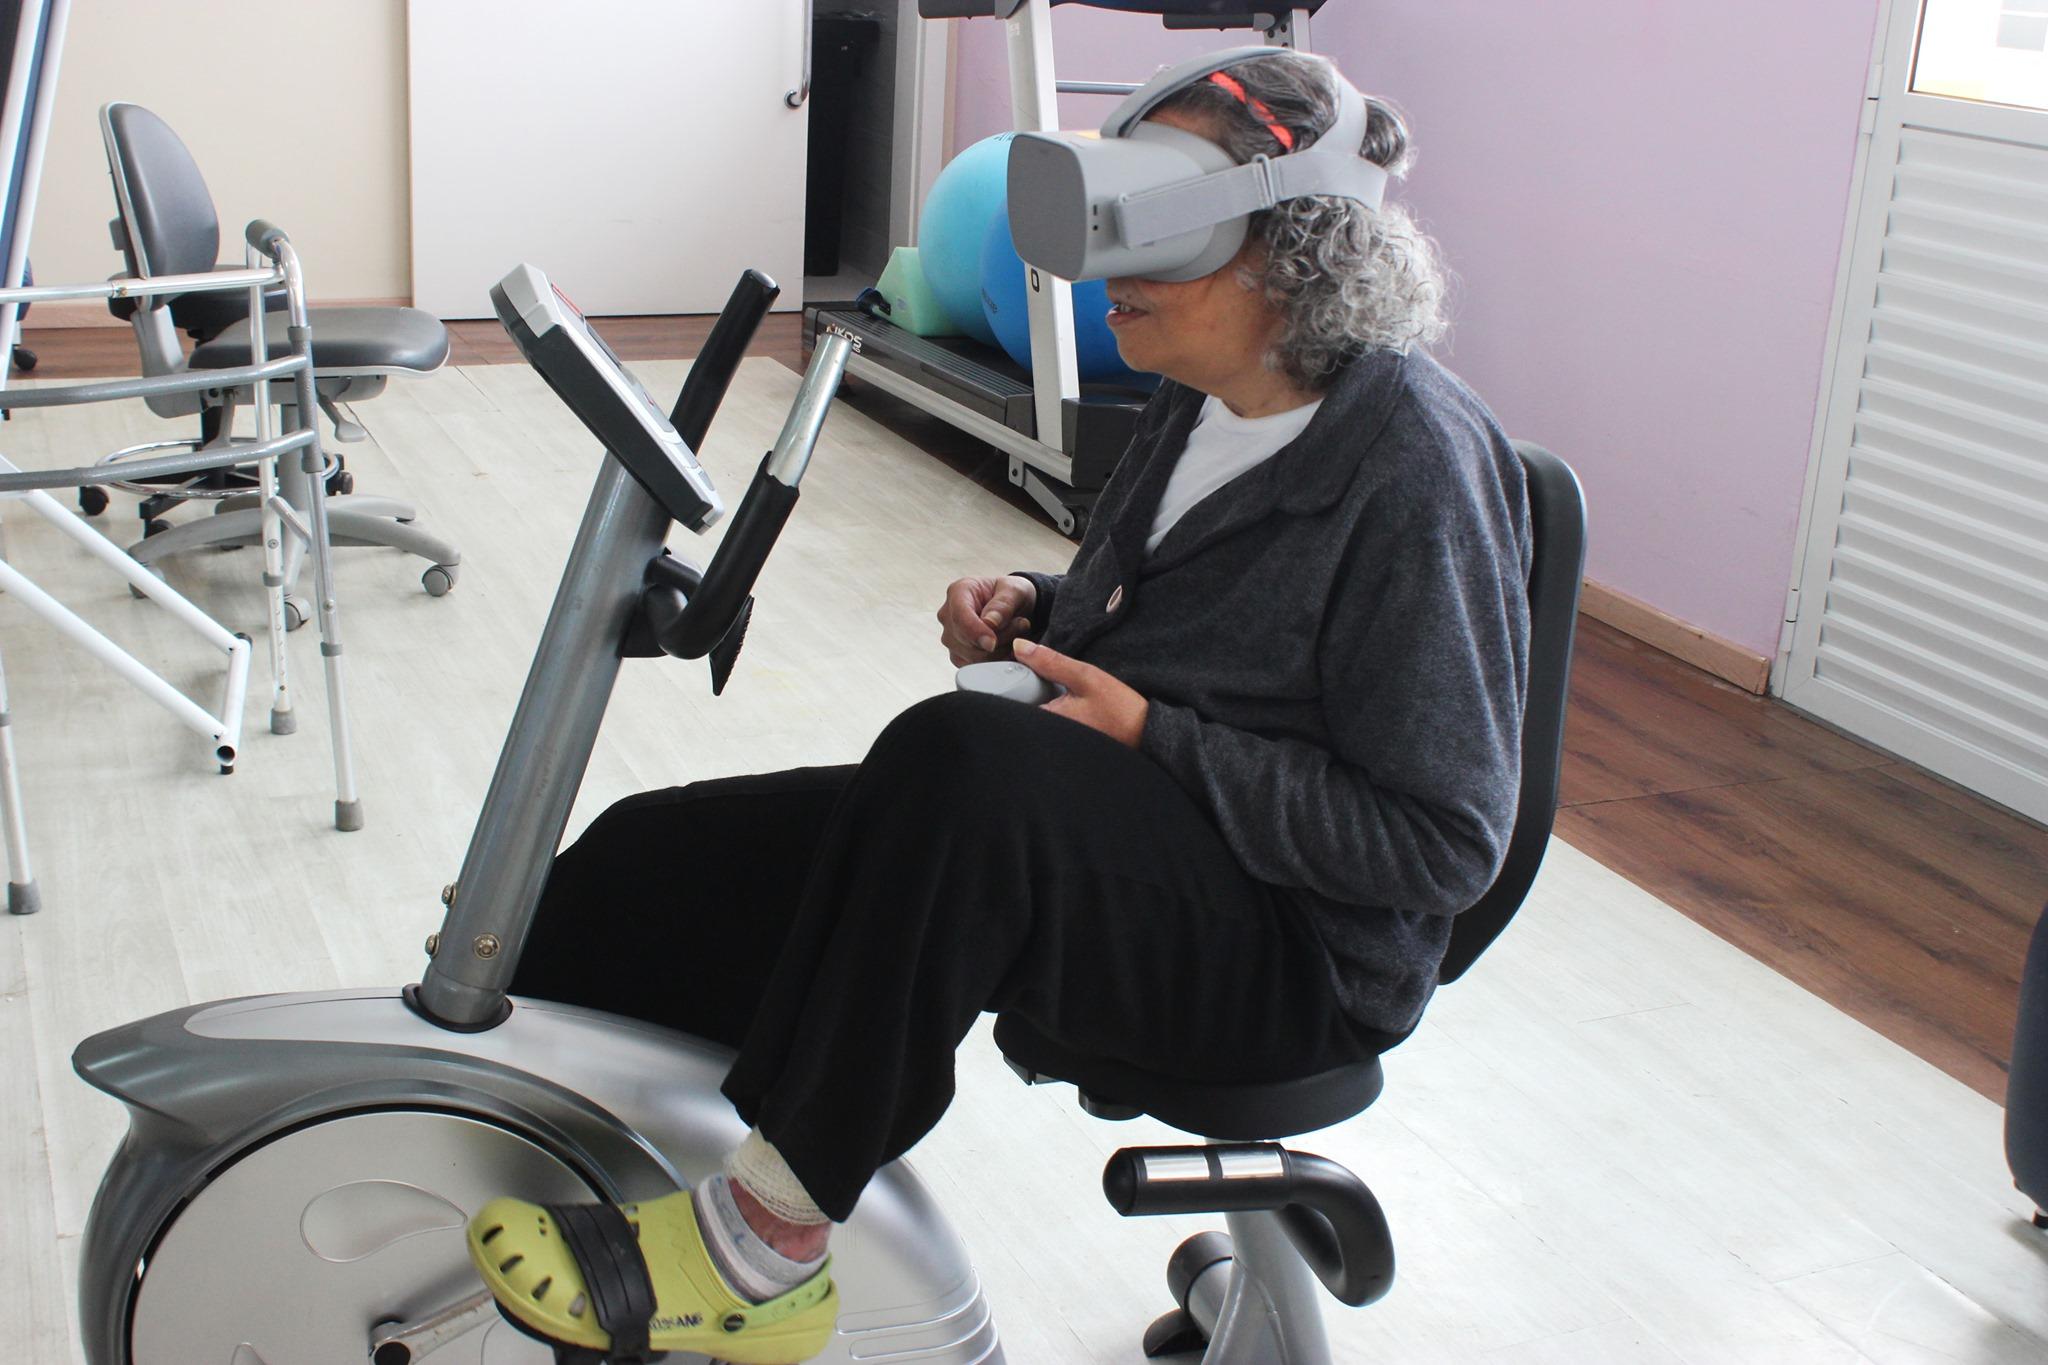 Fisioterapia com Realidade Virtual